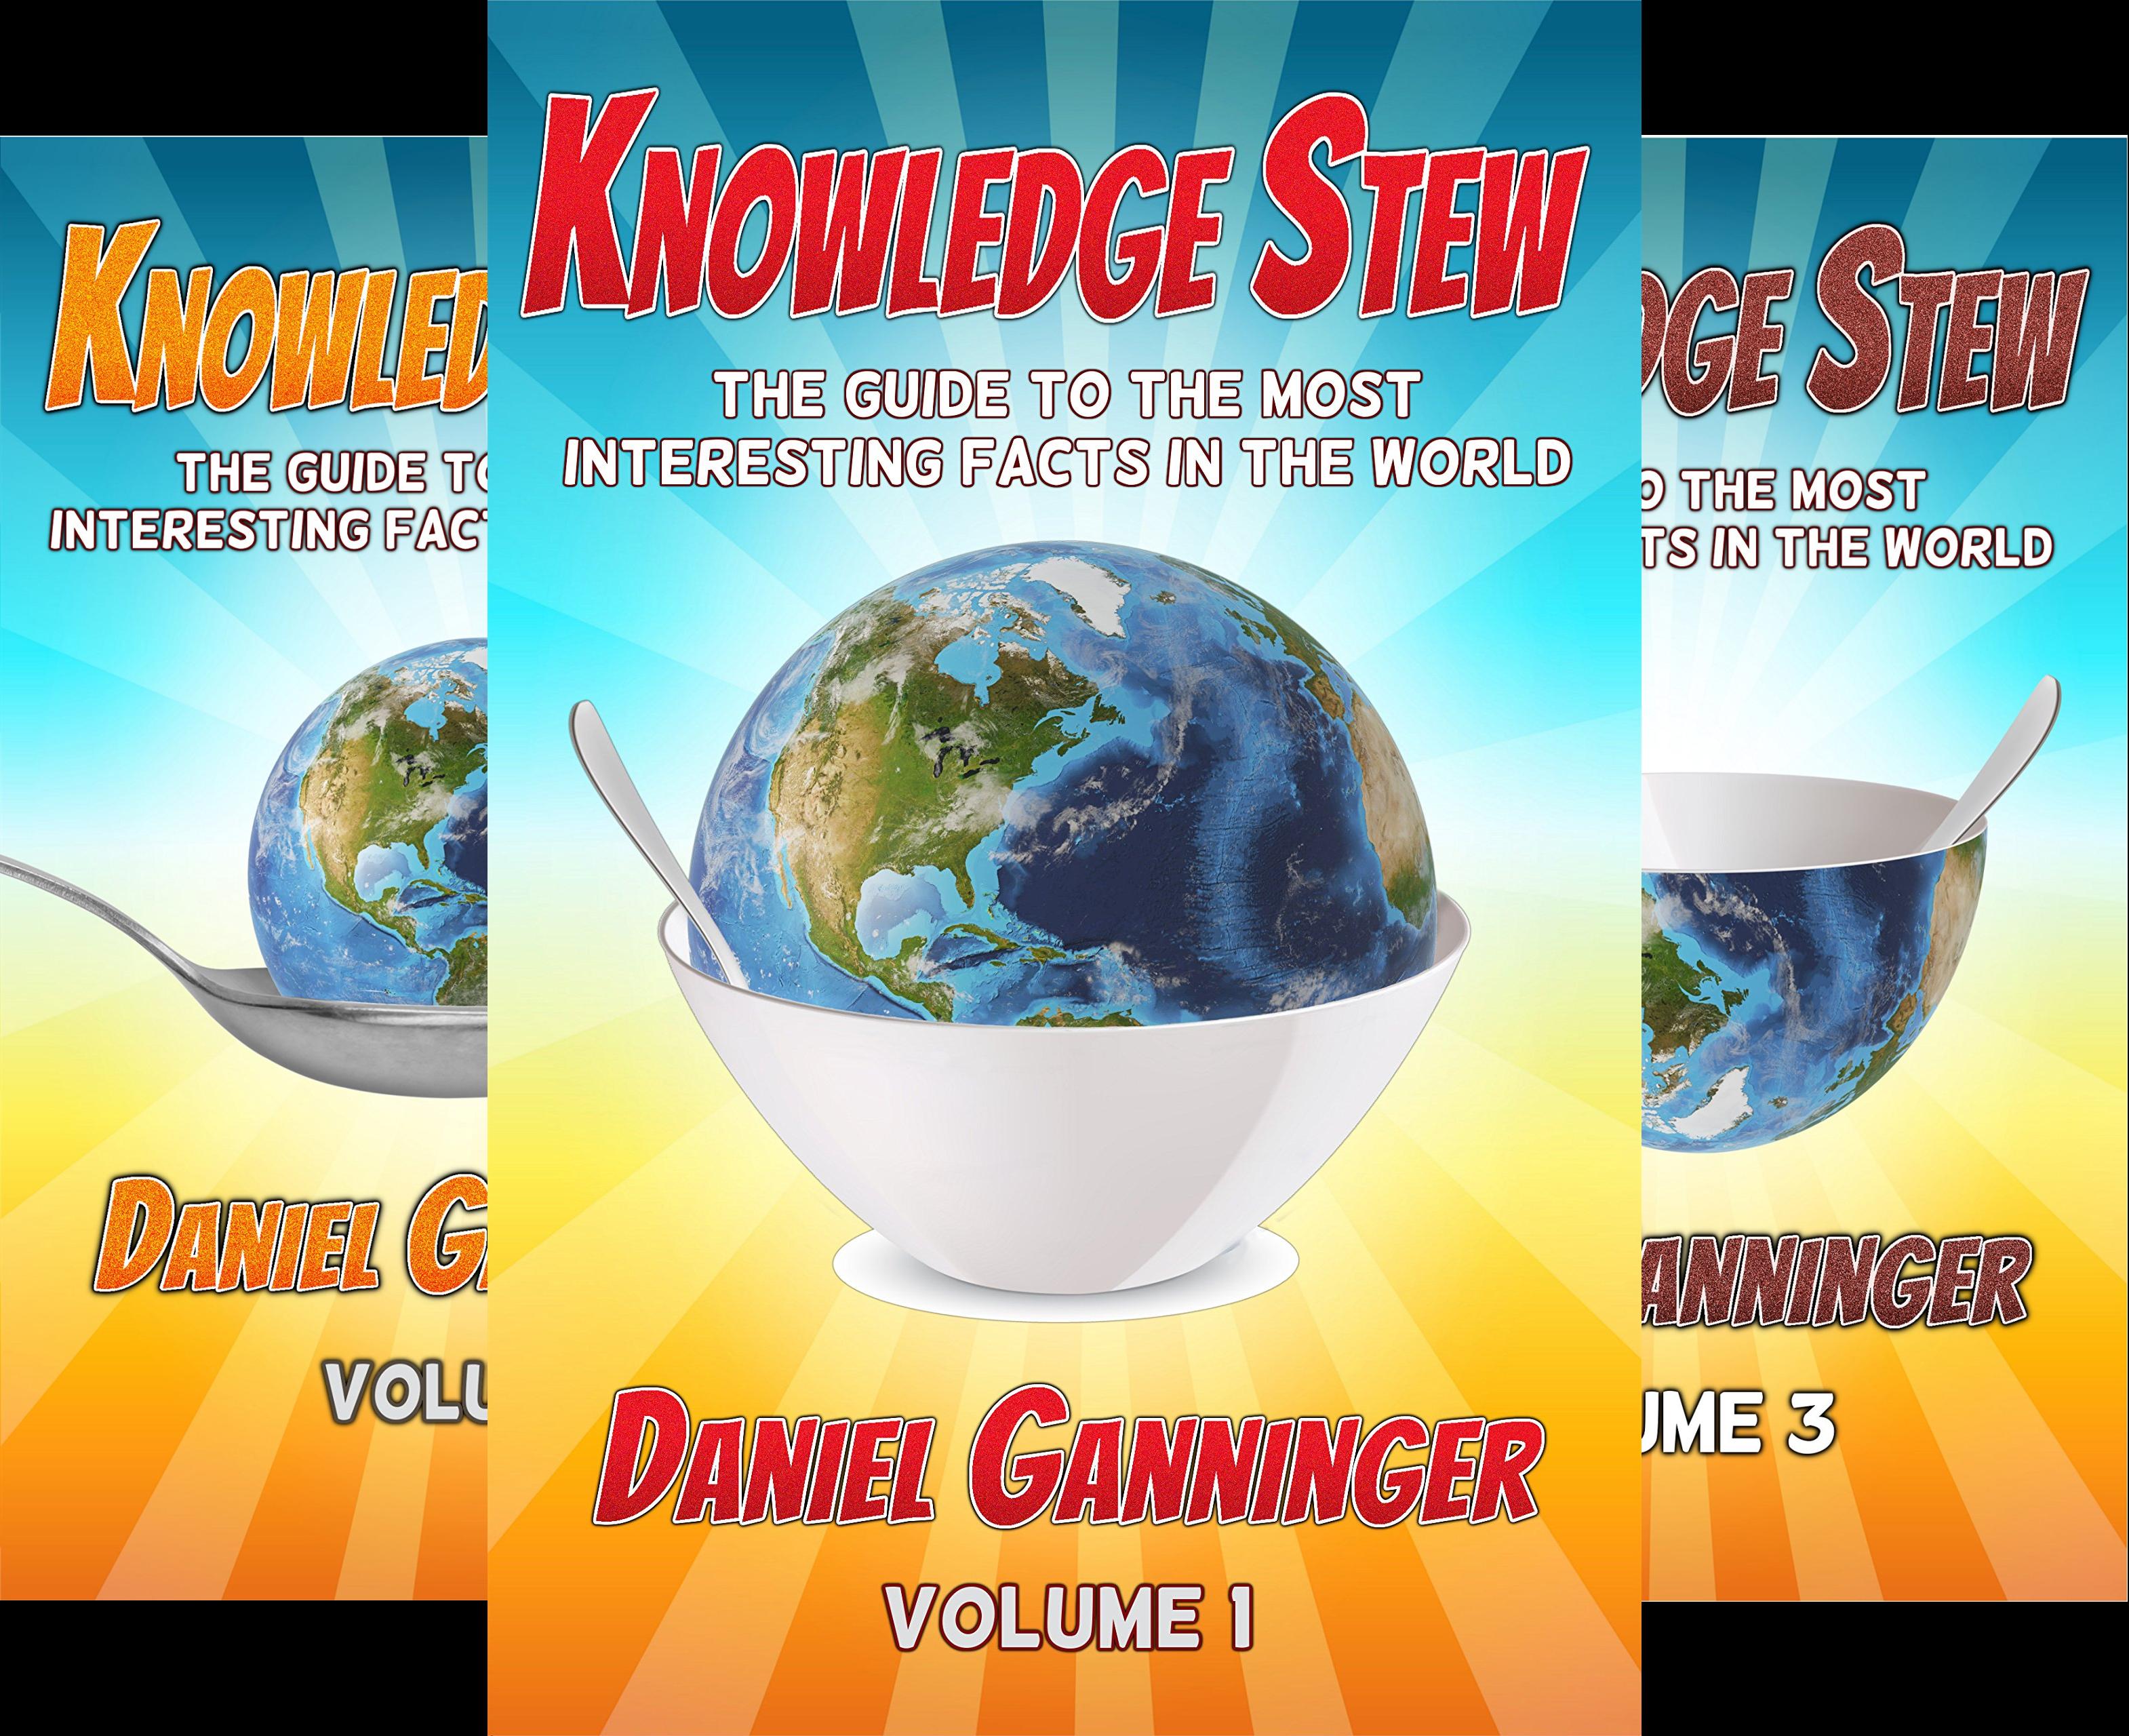 Knowledge Stew (4 Book Series)